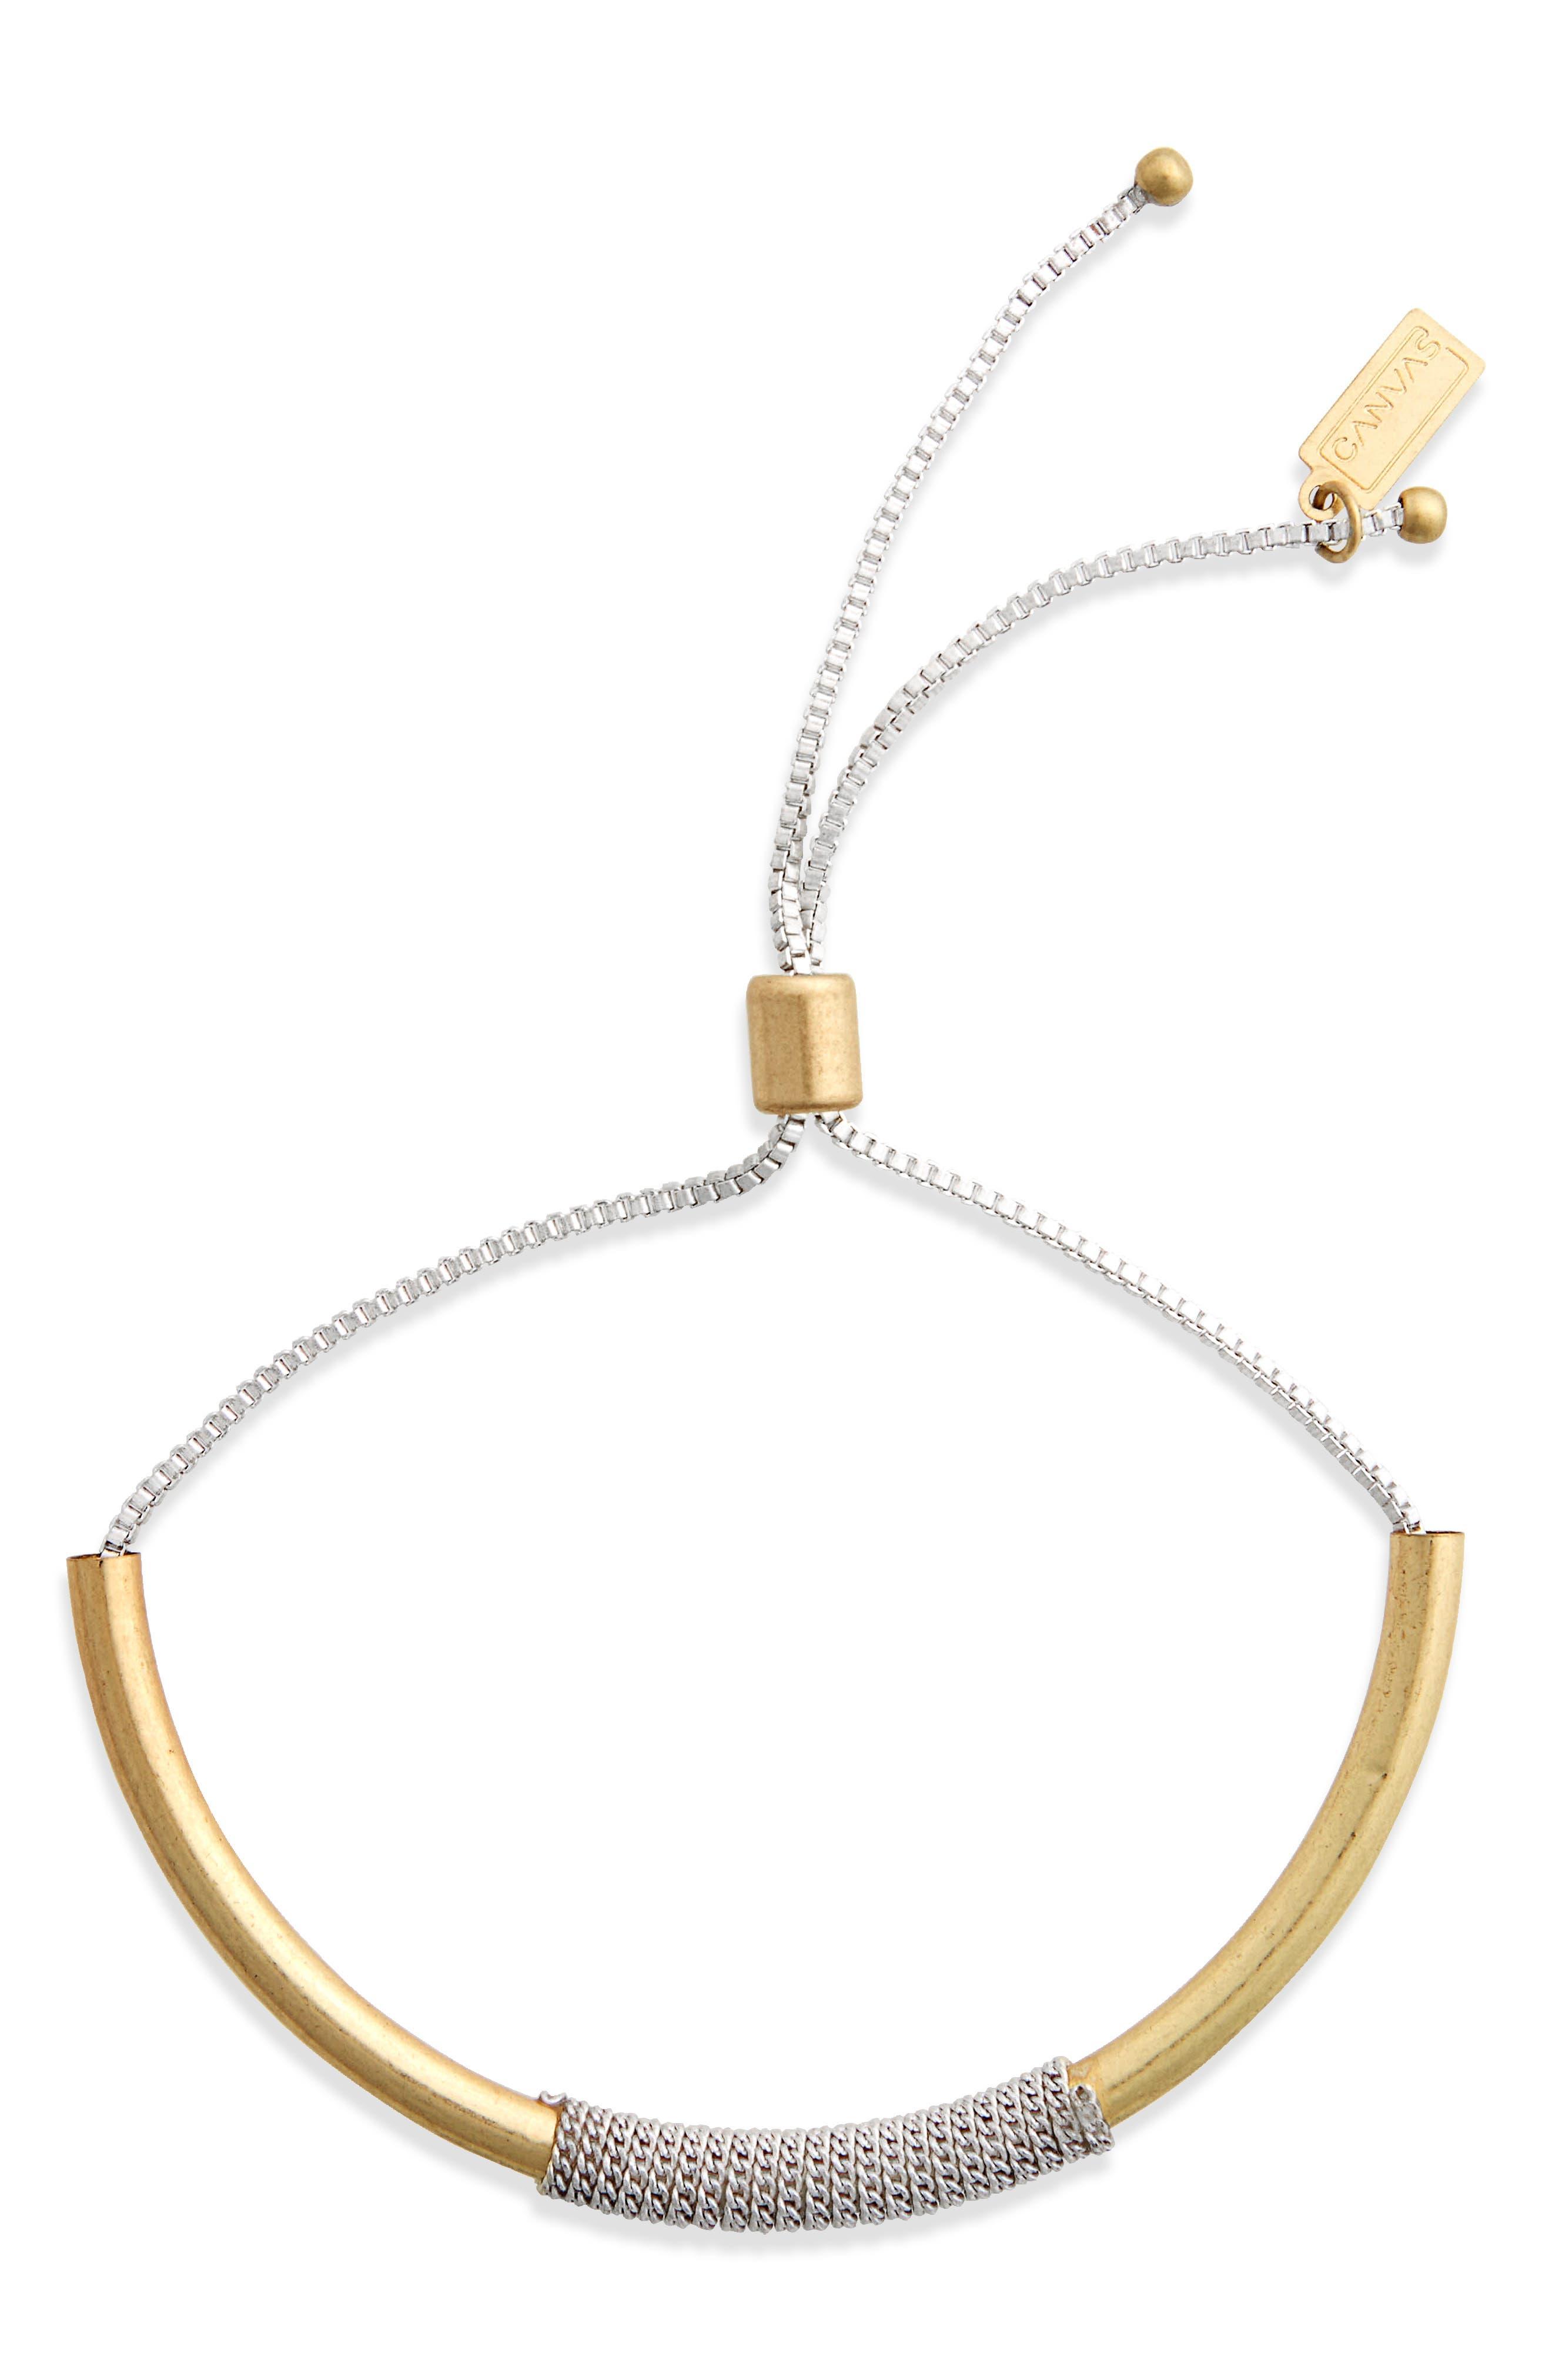 Chain & Metal Bar Bolo Bracelet,                             Main thumbnail 1, color,                             715